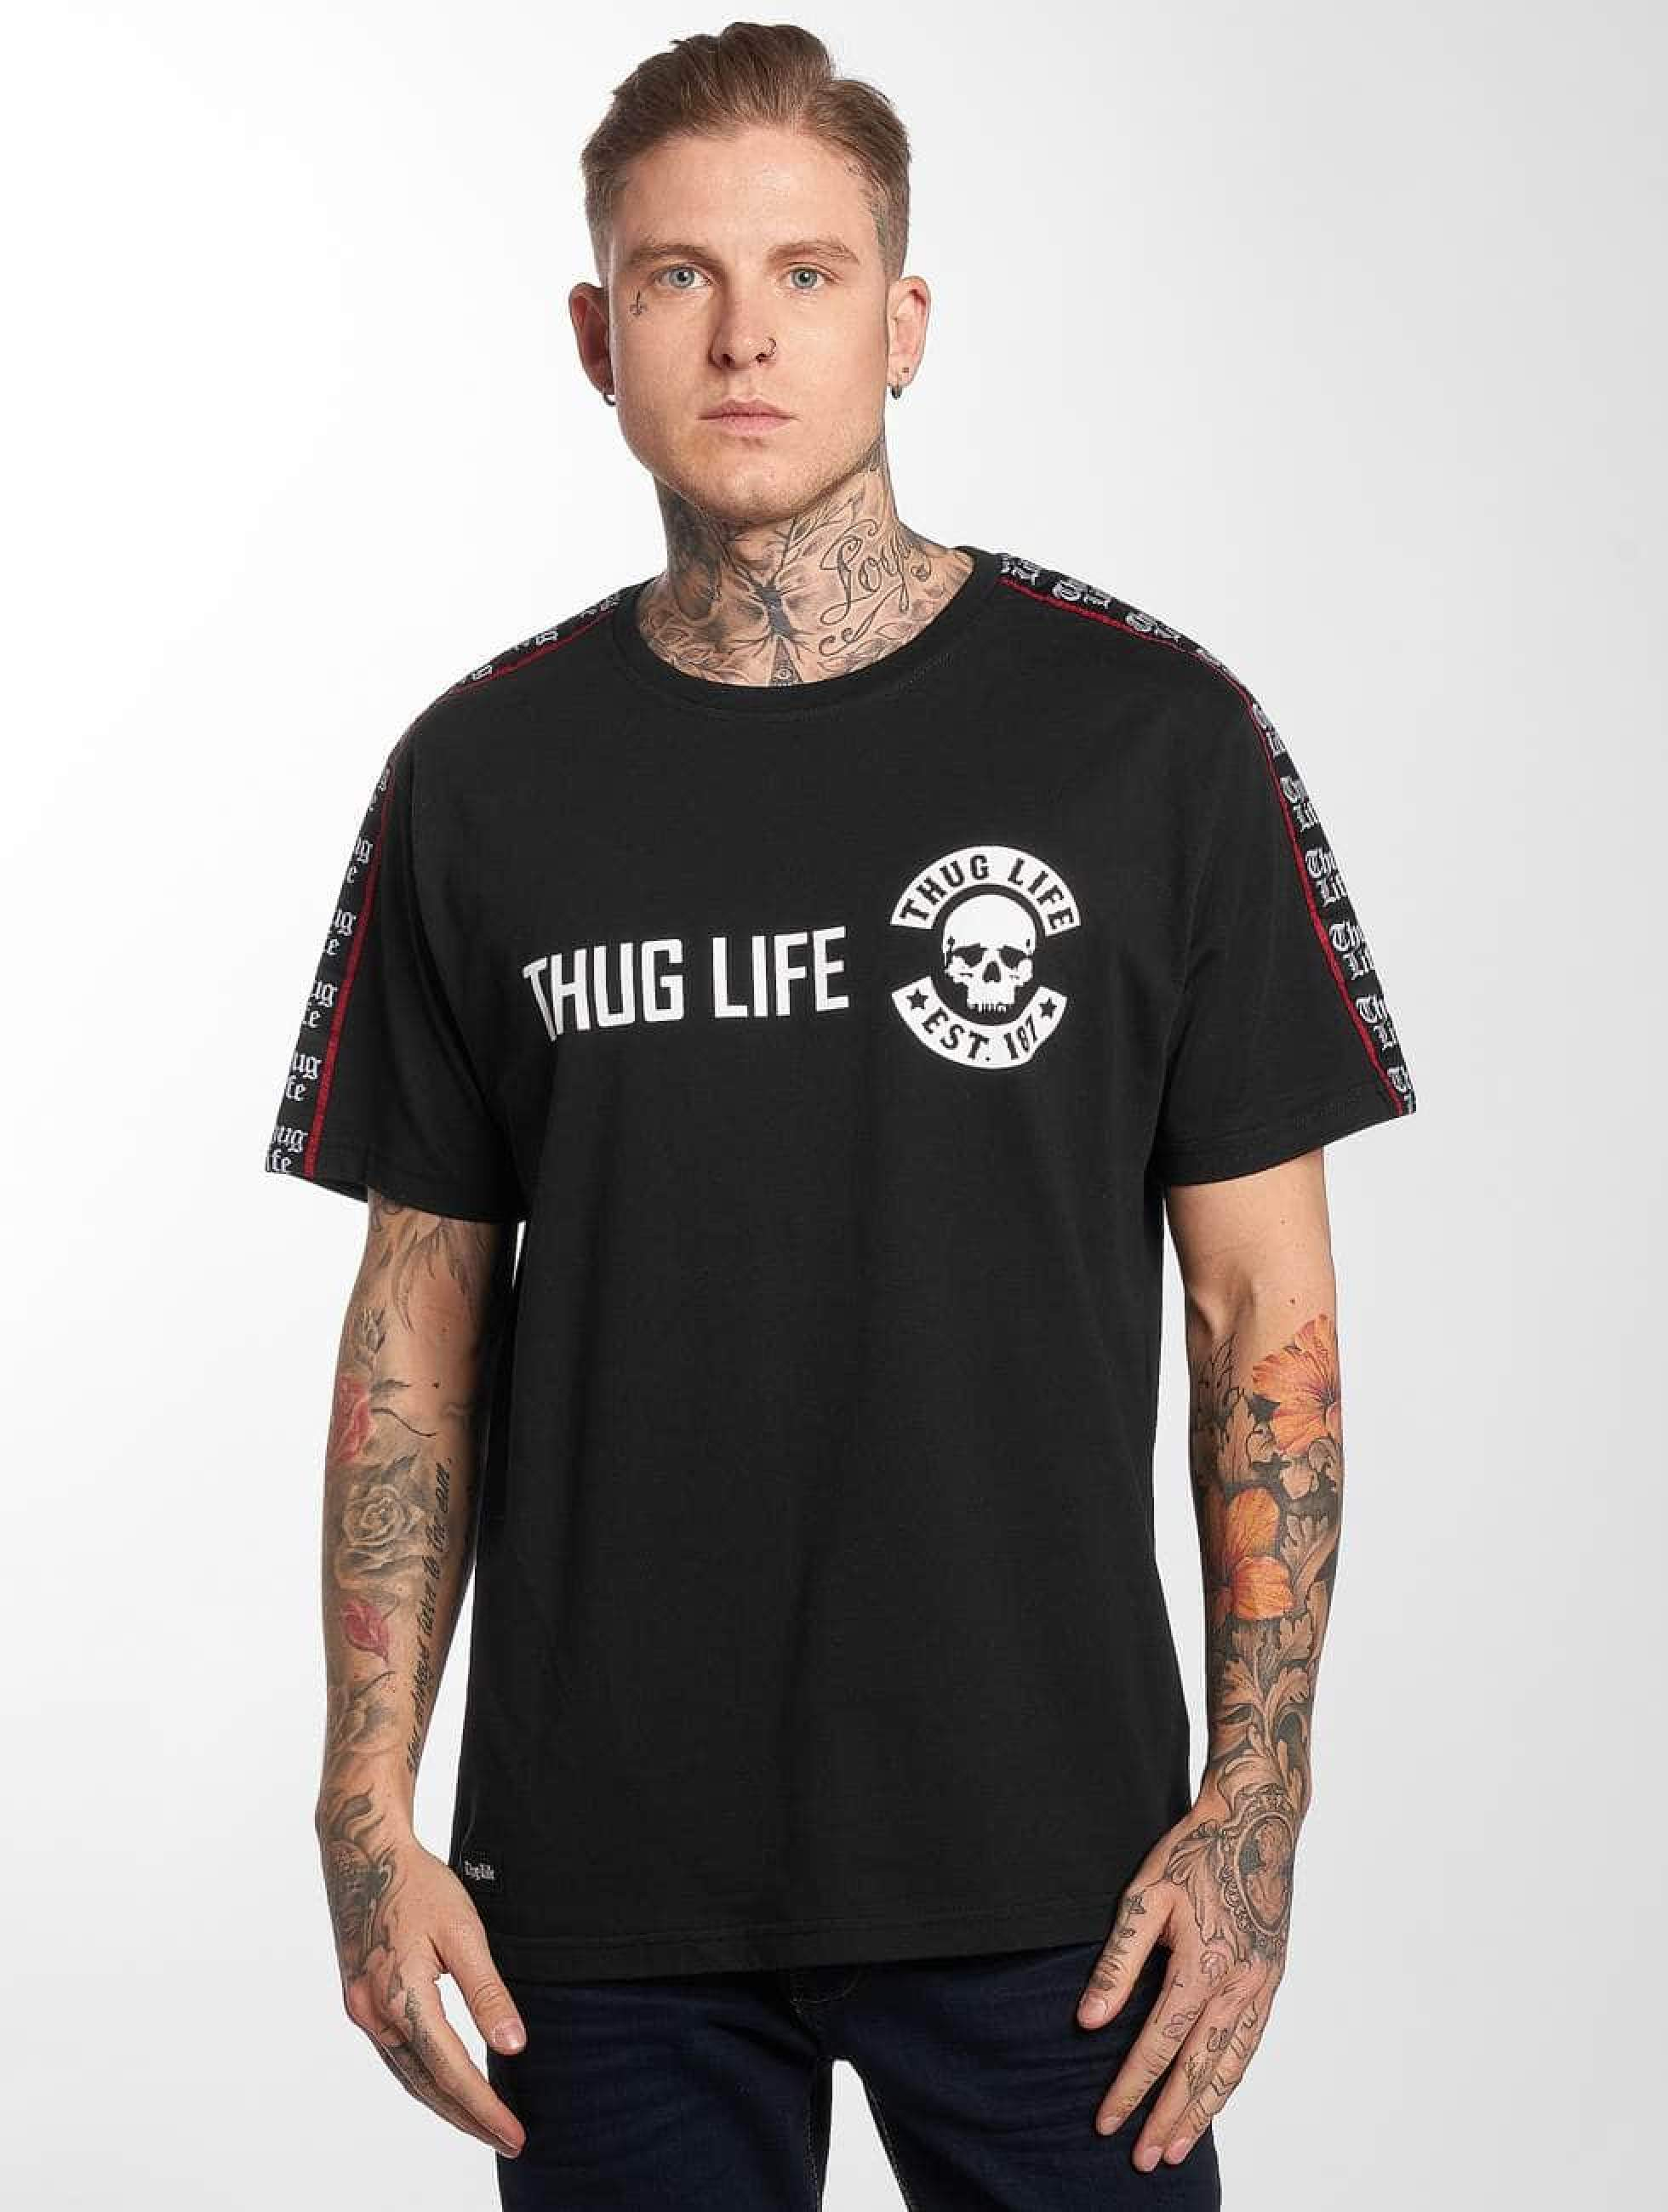 Thug Life / T-Shirt Lux in black L